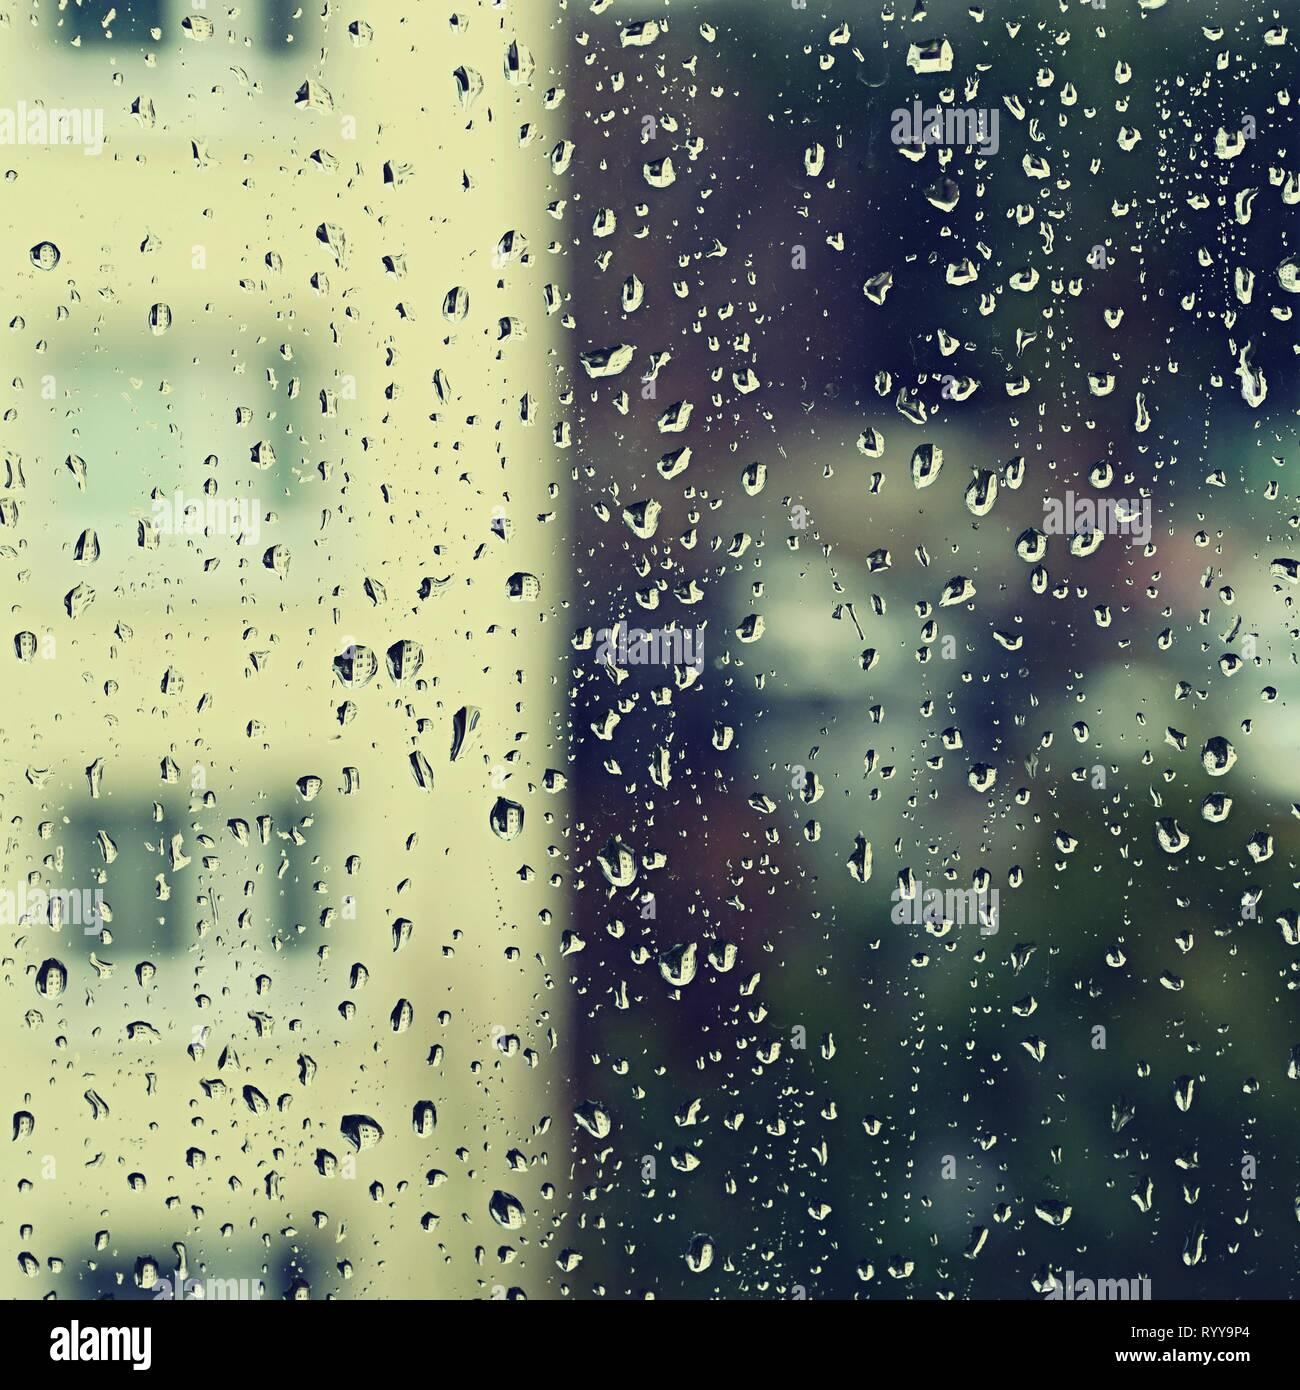 Window Drops Beautiful Background For Rain And Bad Weather Stock Photo Alamy